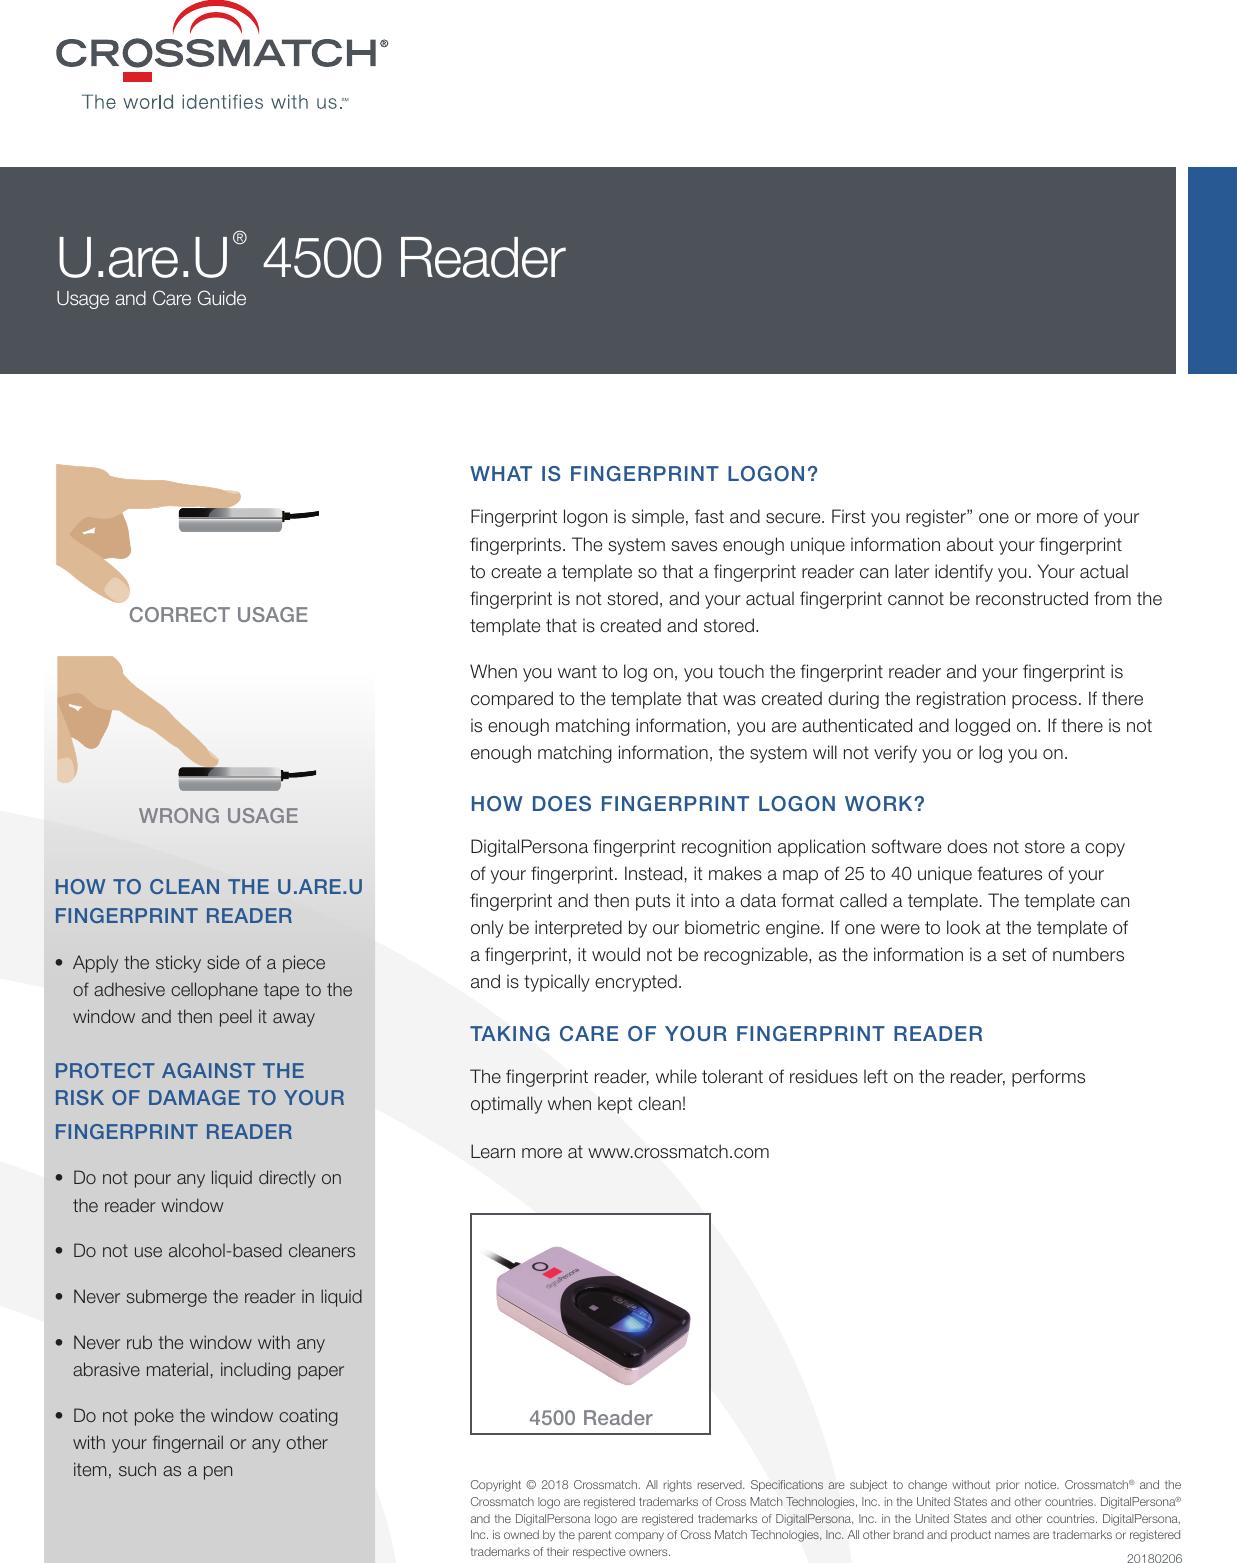 Crossmatch | U are U 4500 Reader Usage And Care Guide